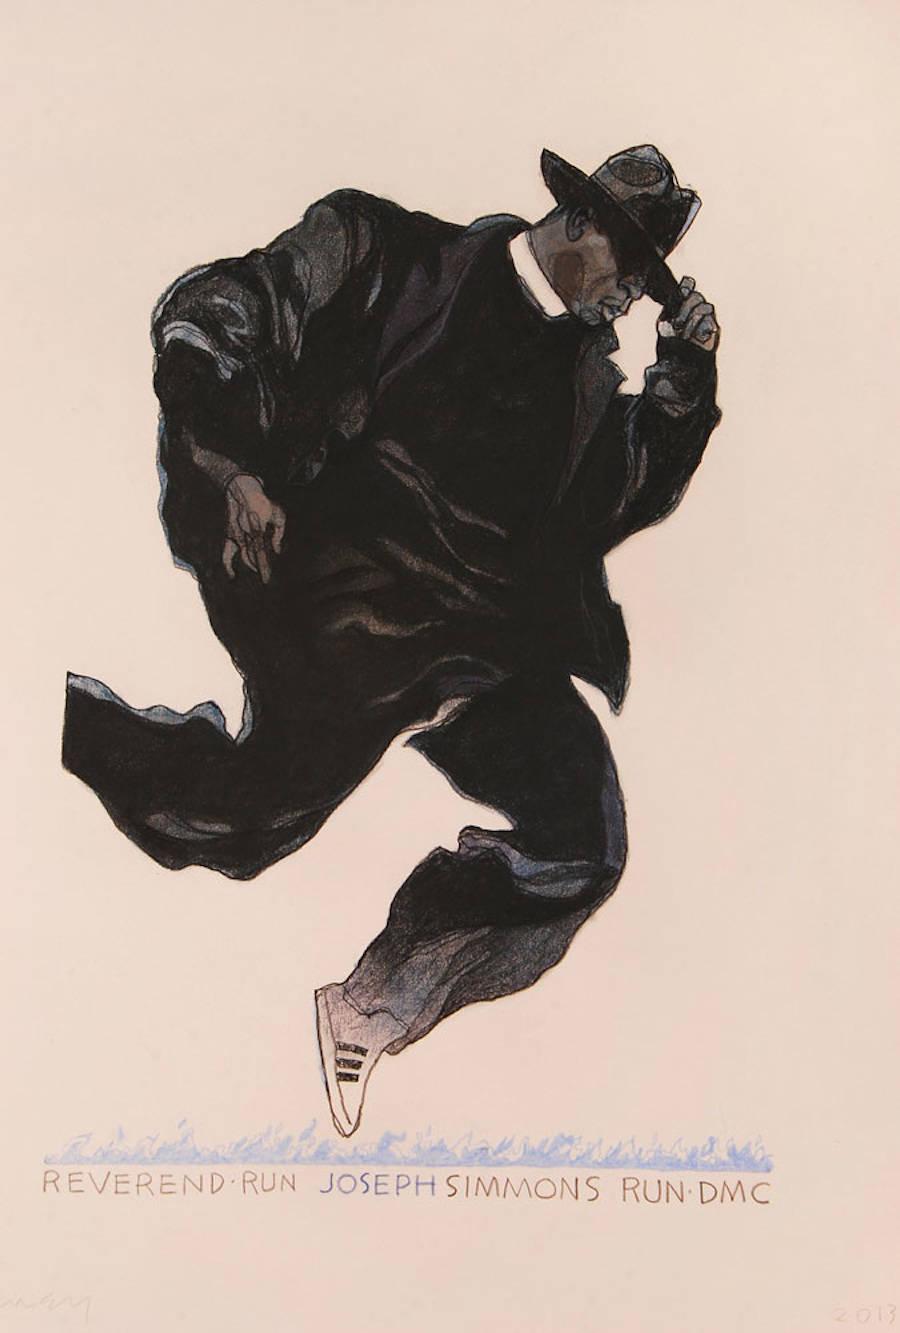 Original Illustrations of Celebrities by Gary Kelley